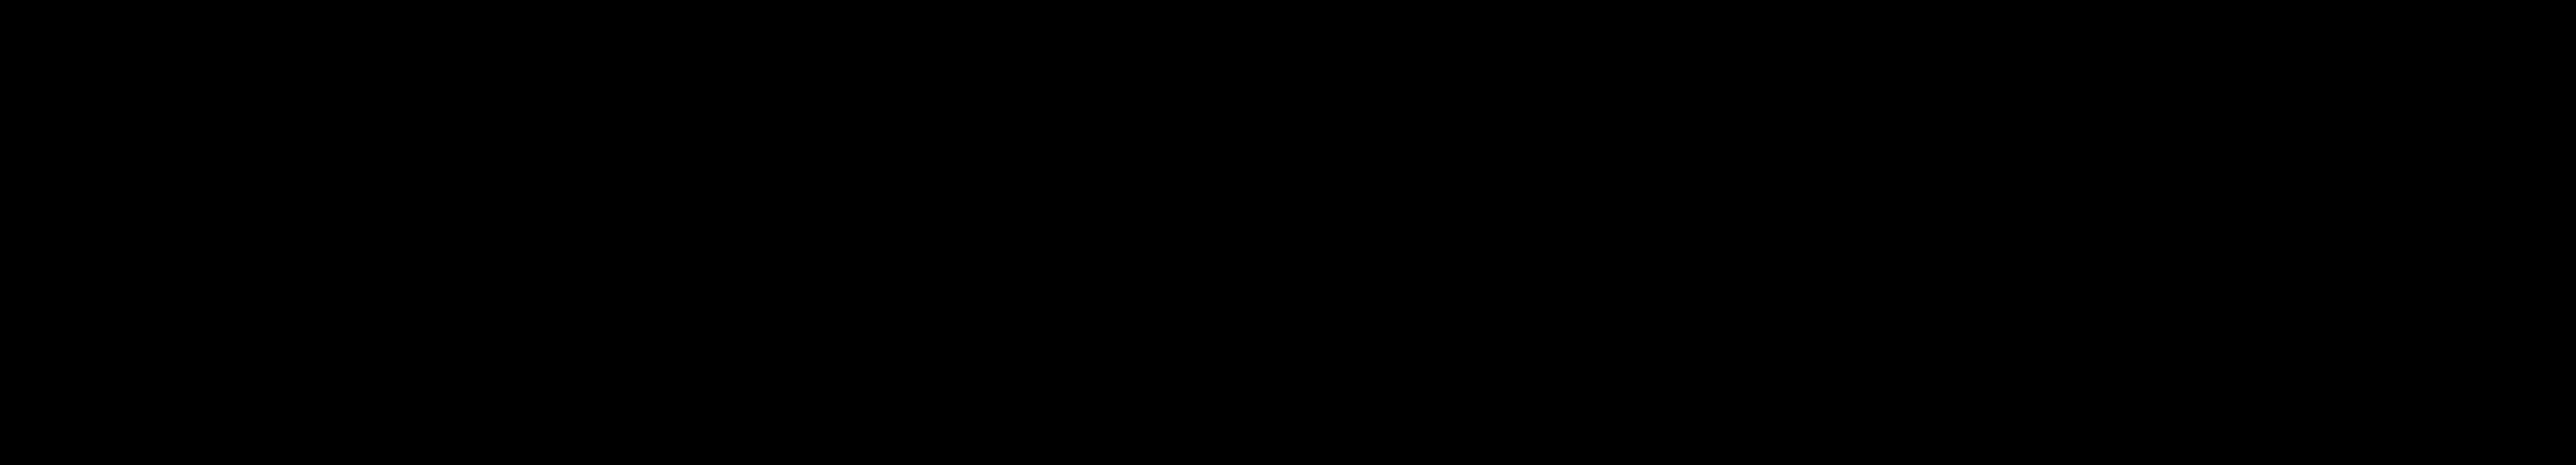 #draco #malfoy #dracomalfoy #malfoyfamily #harrypotter #tomfelton #hot #loml #tom #felton #crush #stickerproducer #tiktok #dracotiktok #harrypotter #wizardingworld #witch #wizard #warlock #hp #pottermore #wand #patronus #Hufflepuff #Ravenclaw #Slytherin #Gryffindor #sortinghat #hogwarts #magic #spell #spells #hogwartsschool #school #butterbeer #harrypotteredit #harry #potter #book #series #movie #fandom #dracomalfoyedit #dracoishot #dracoedit #premades #complexedit #complex #premade #complexedits #malfoyedit @picsart @picsartpartnerships @picsartchina